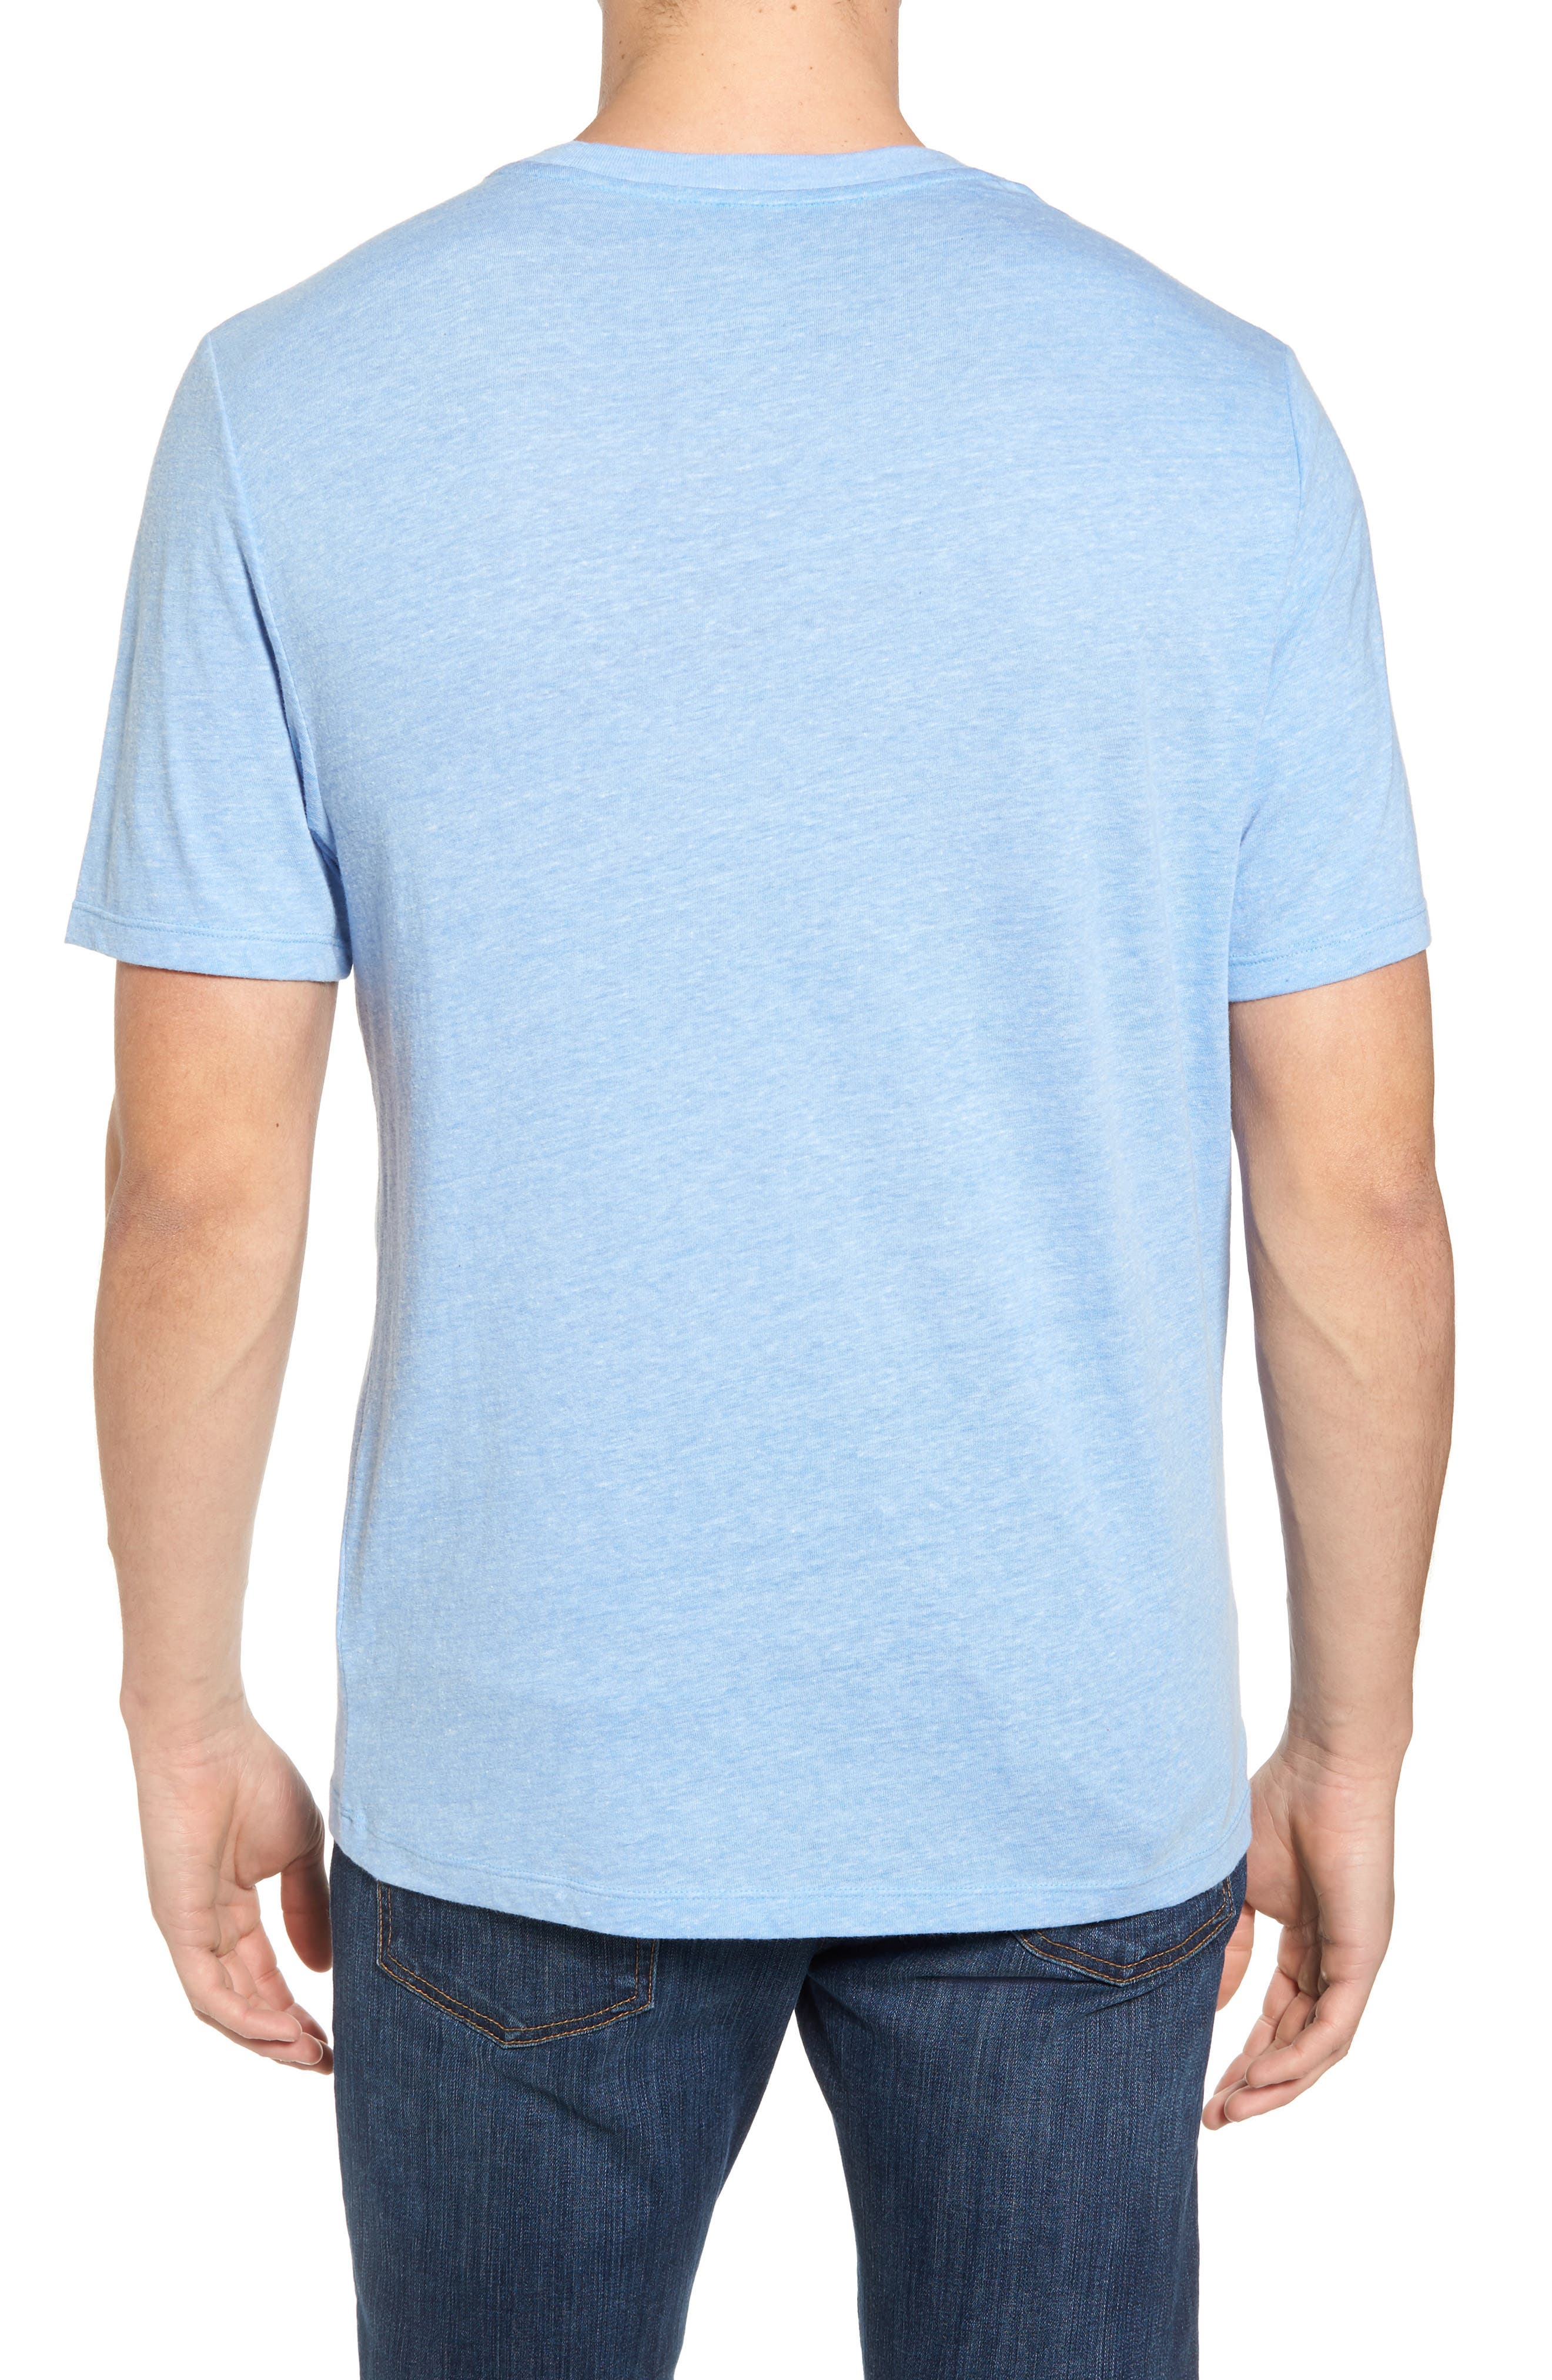 Reel Life Graphic T-Shirt,                             Alternate thumbnail 2, color,                             Dusty Blue